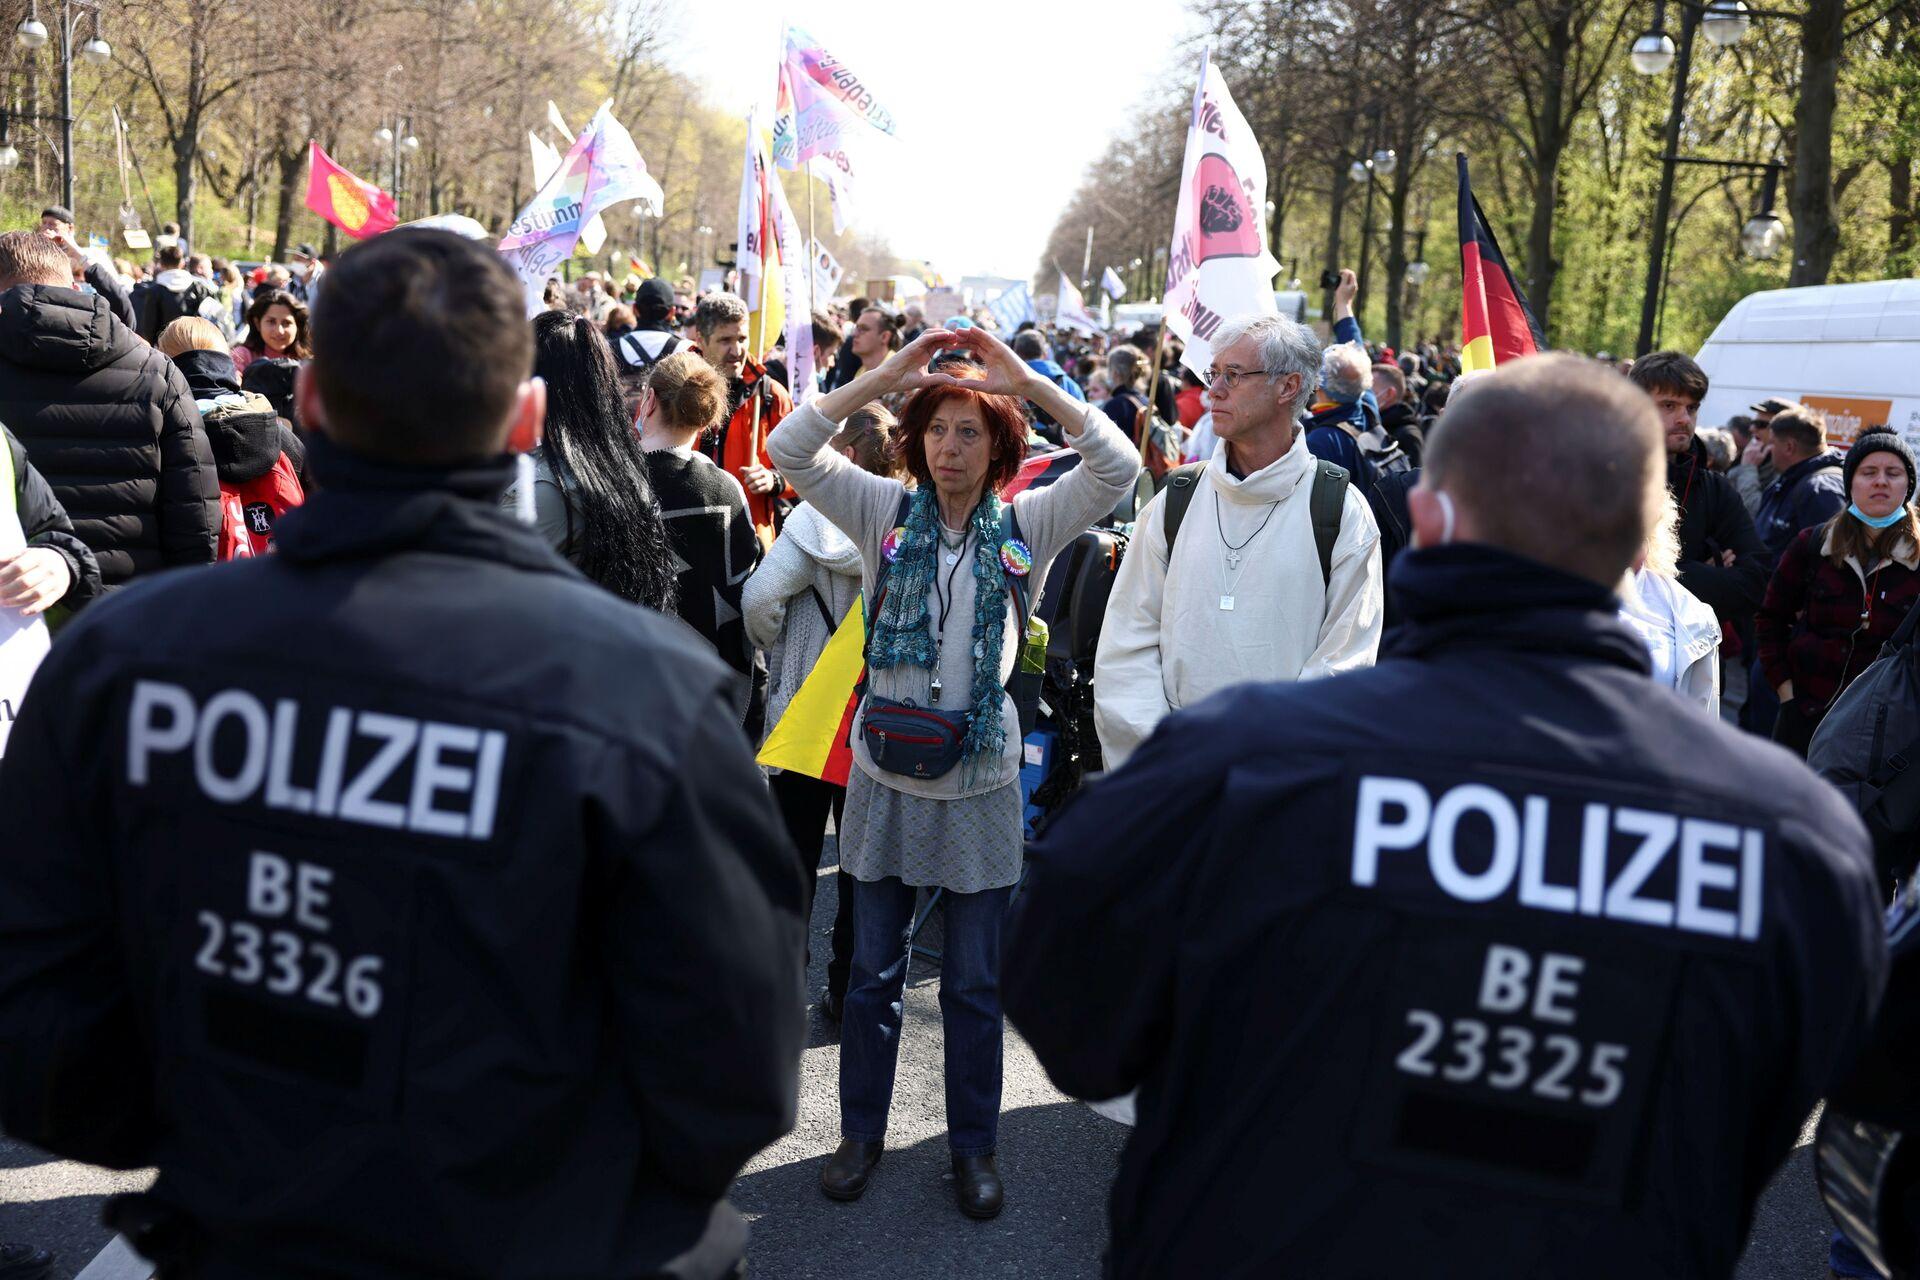 Bundestag Approves Tighter COVID Lockdown Measures as Thousands Protest in Berlin -  Photo, Video - Sputnik International, 1920, 21.04.2021